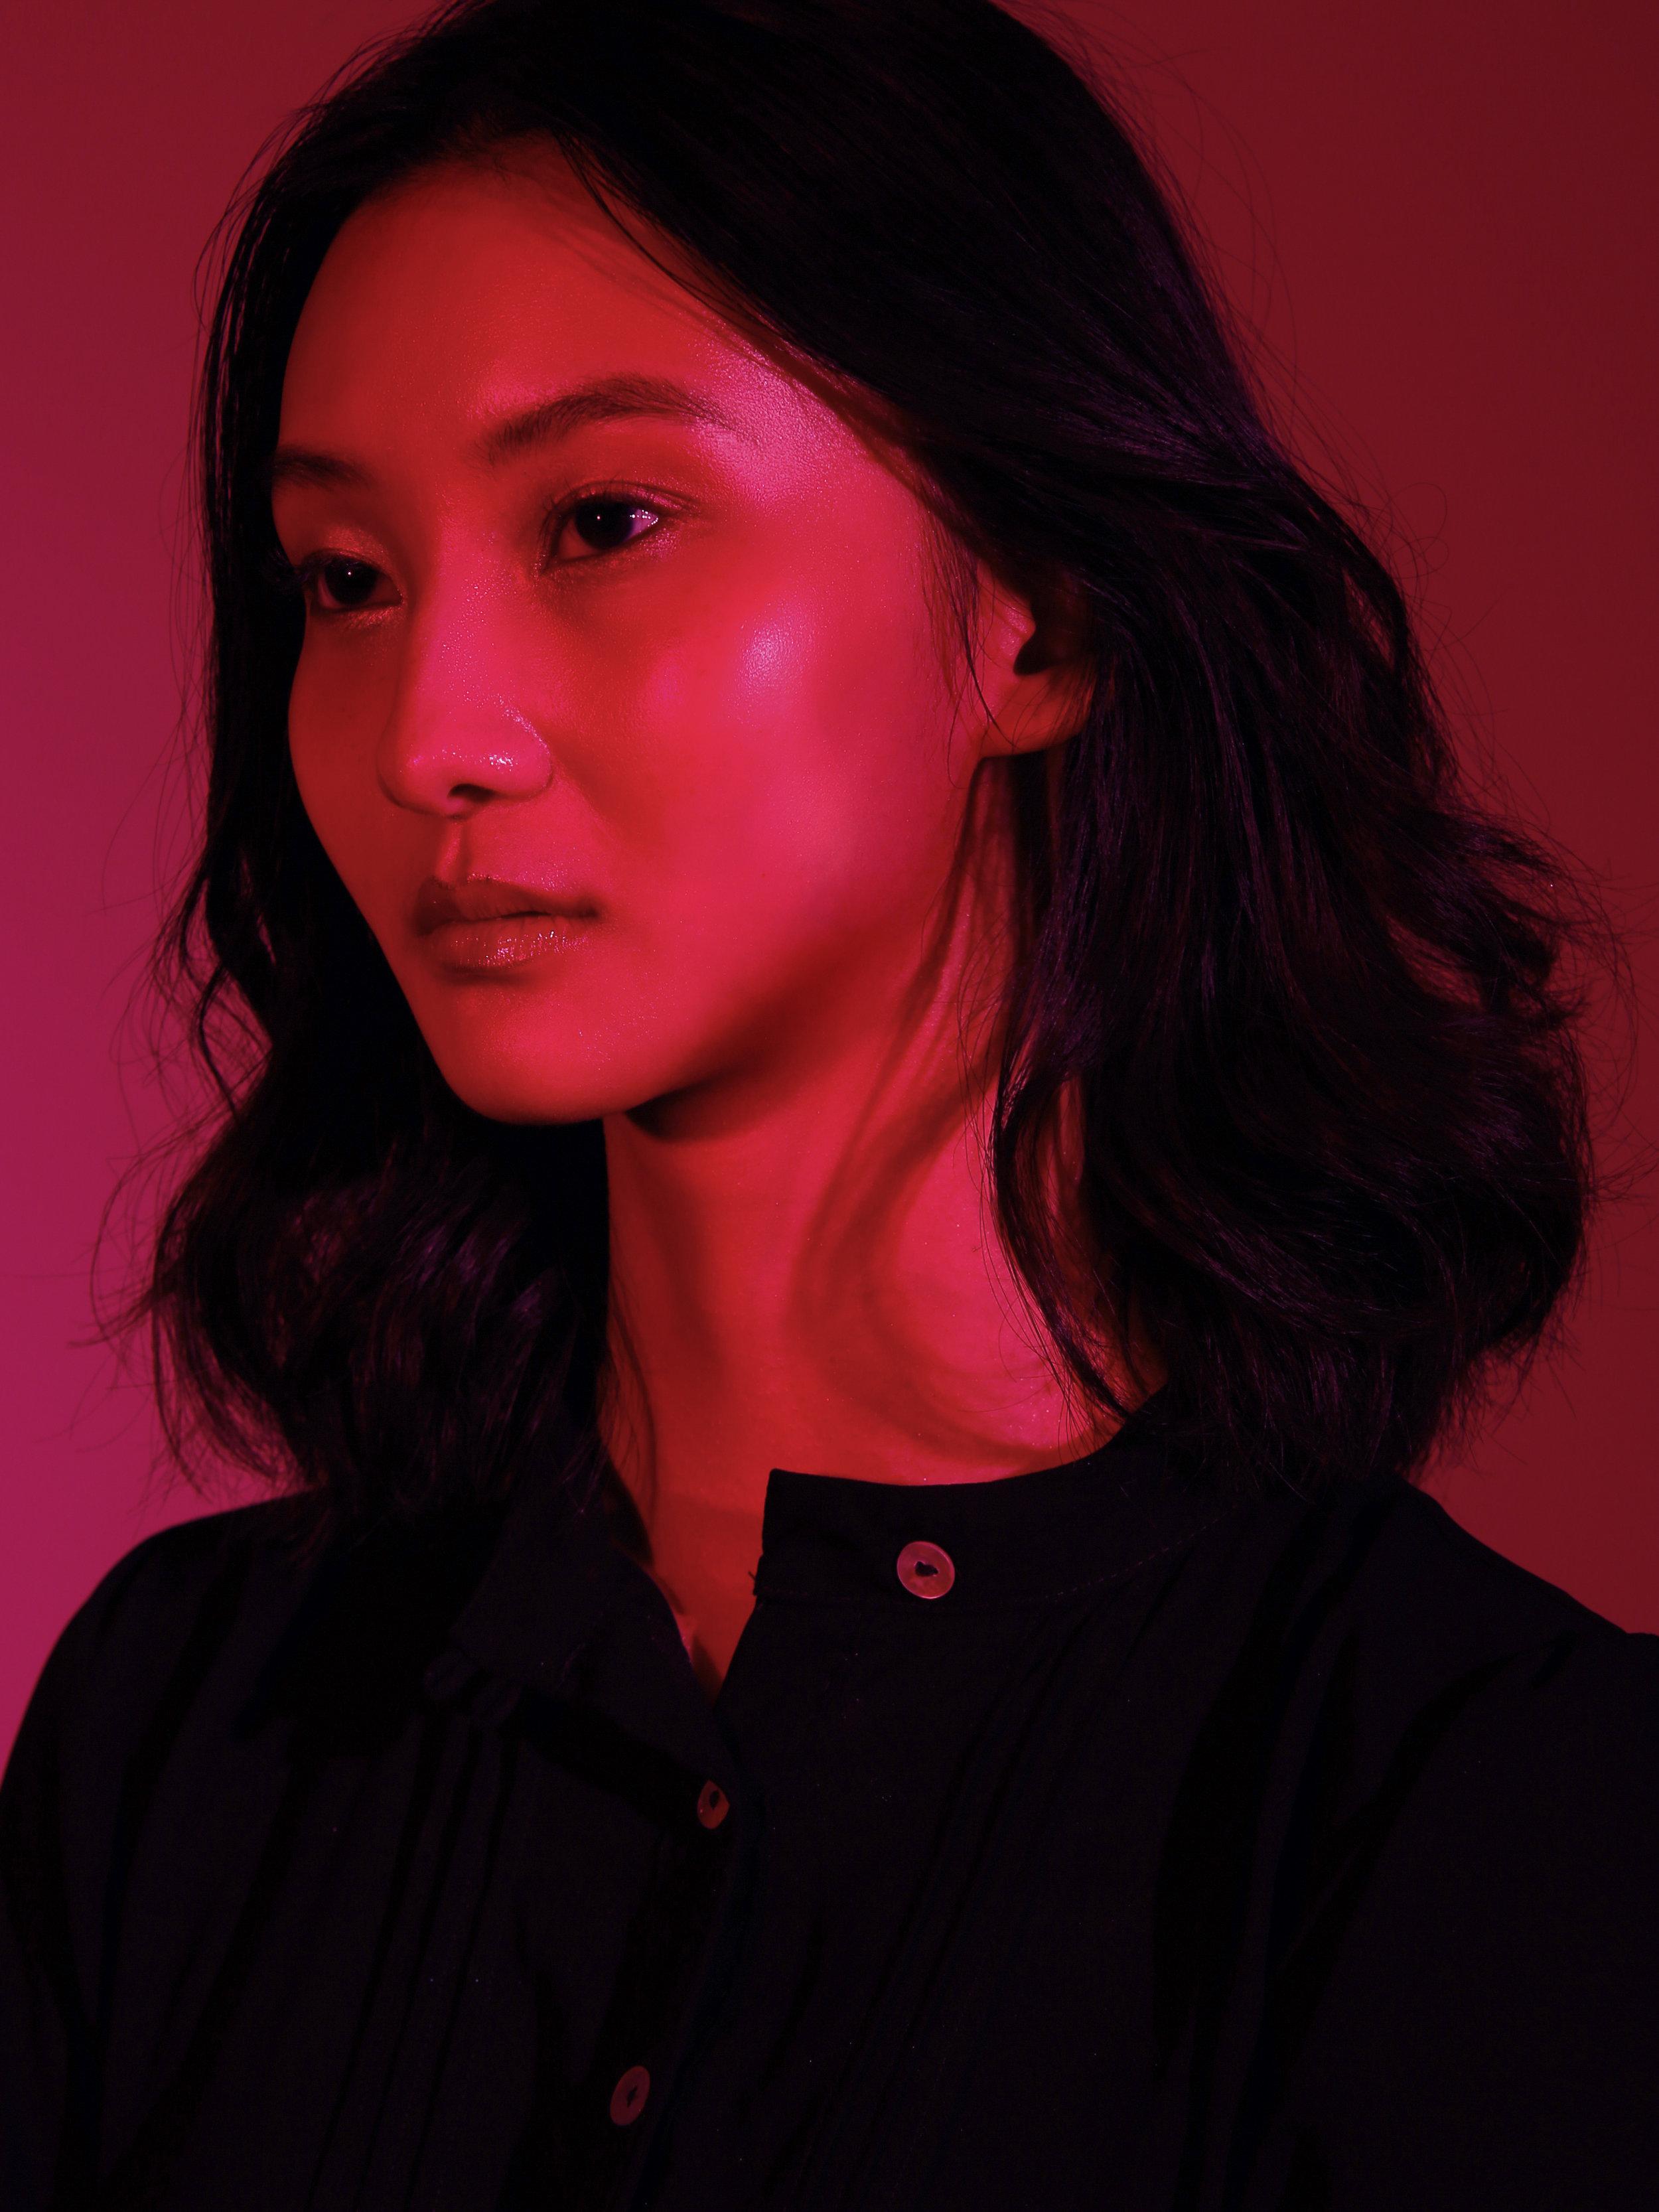 Freja by James Yang Bintang Models